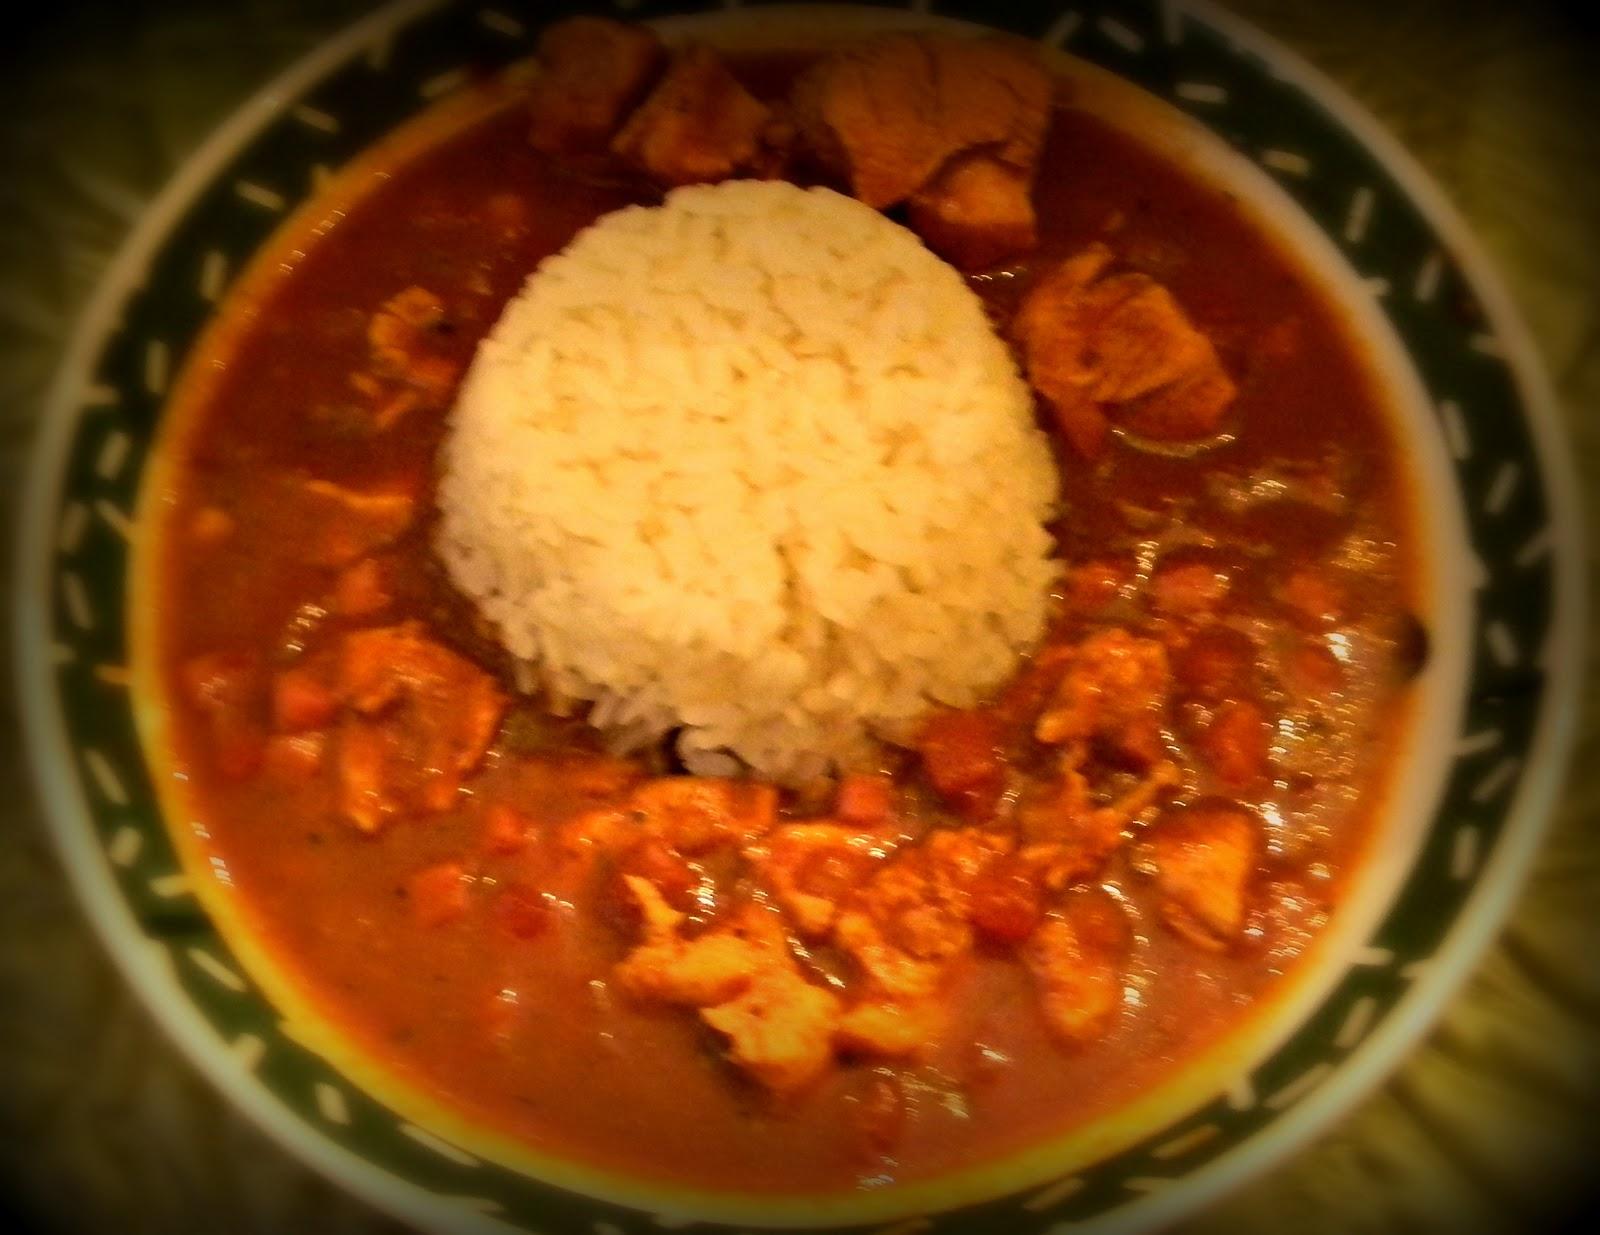 Pollo Guisado Con Canela Cinnamon Chicken Stew The Self Taught Cook